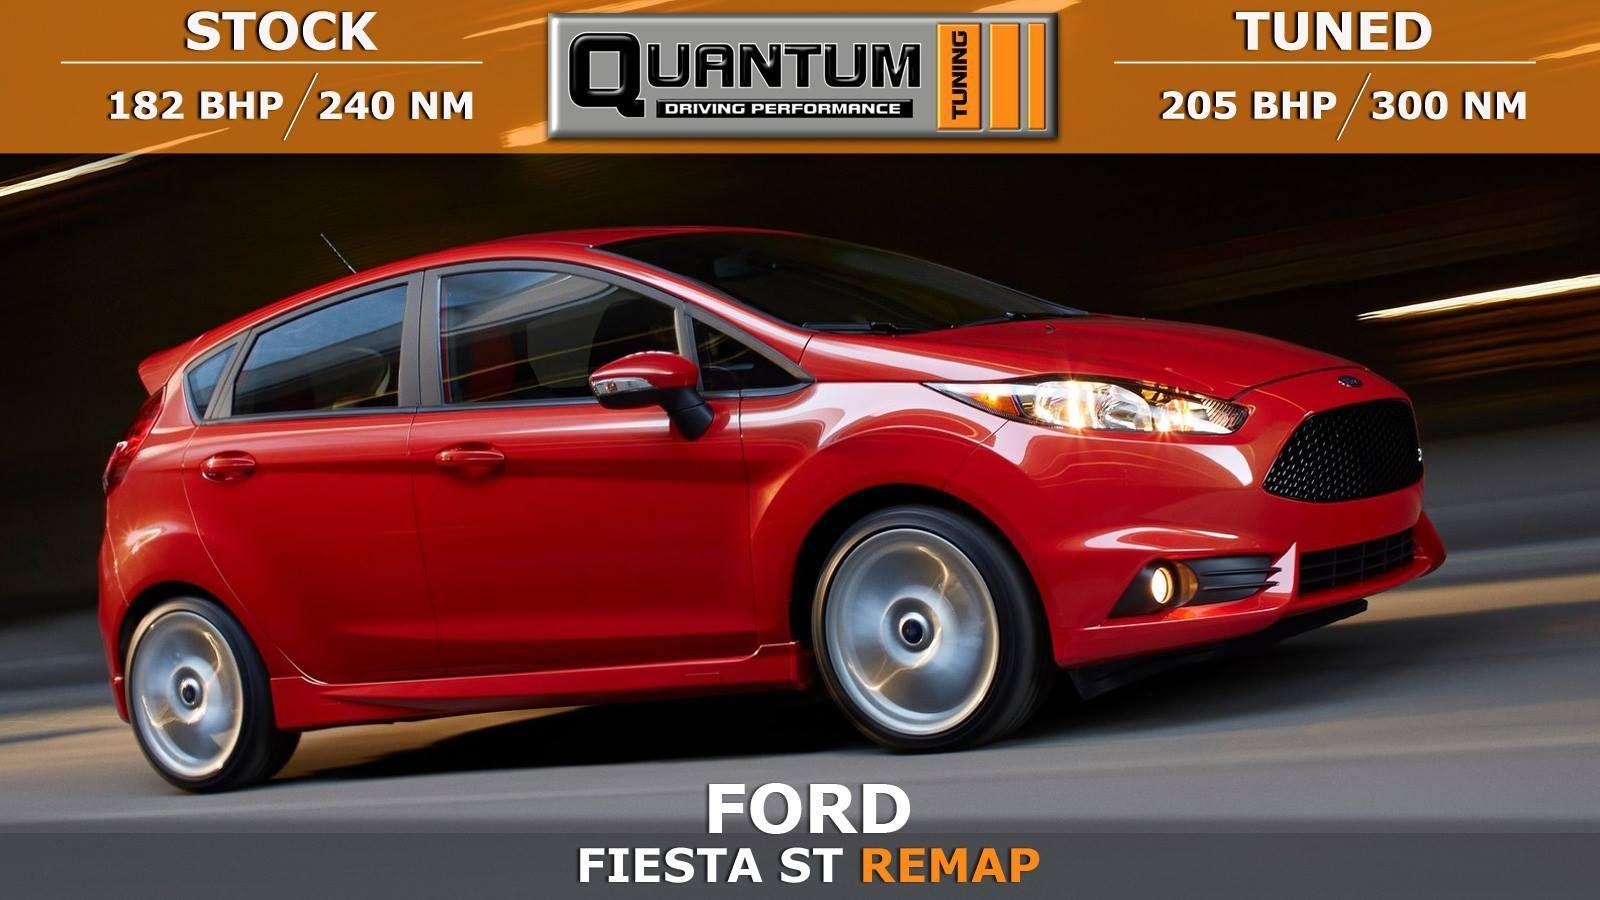 Ford Fiesta St Tuned By Quantum Tuning Original 182 Bhp 240